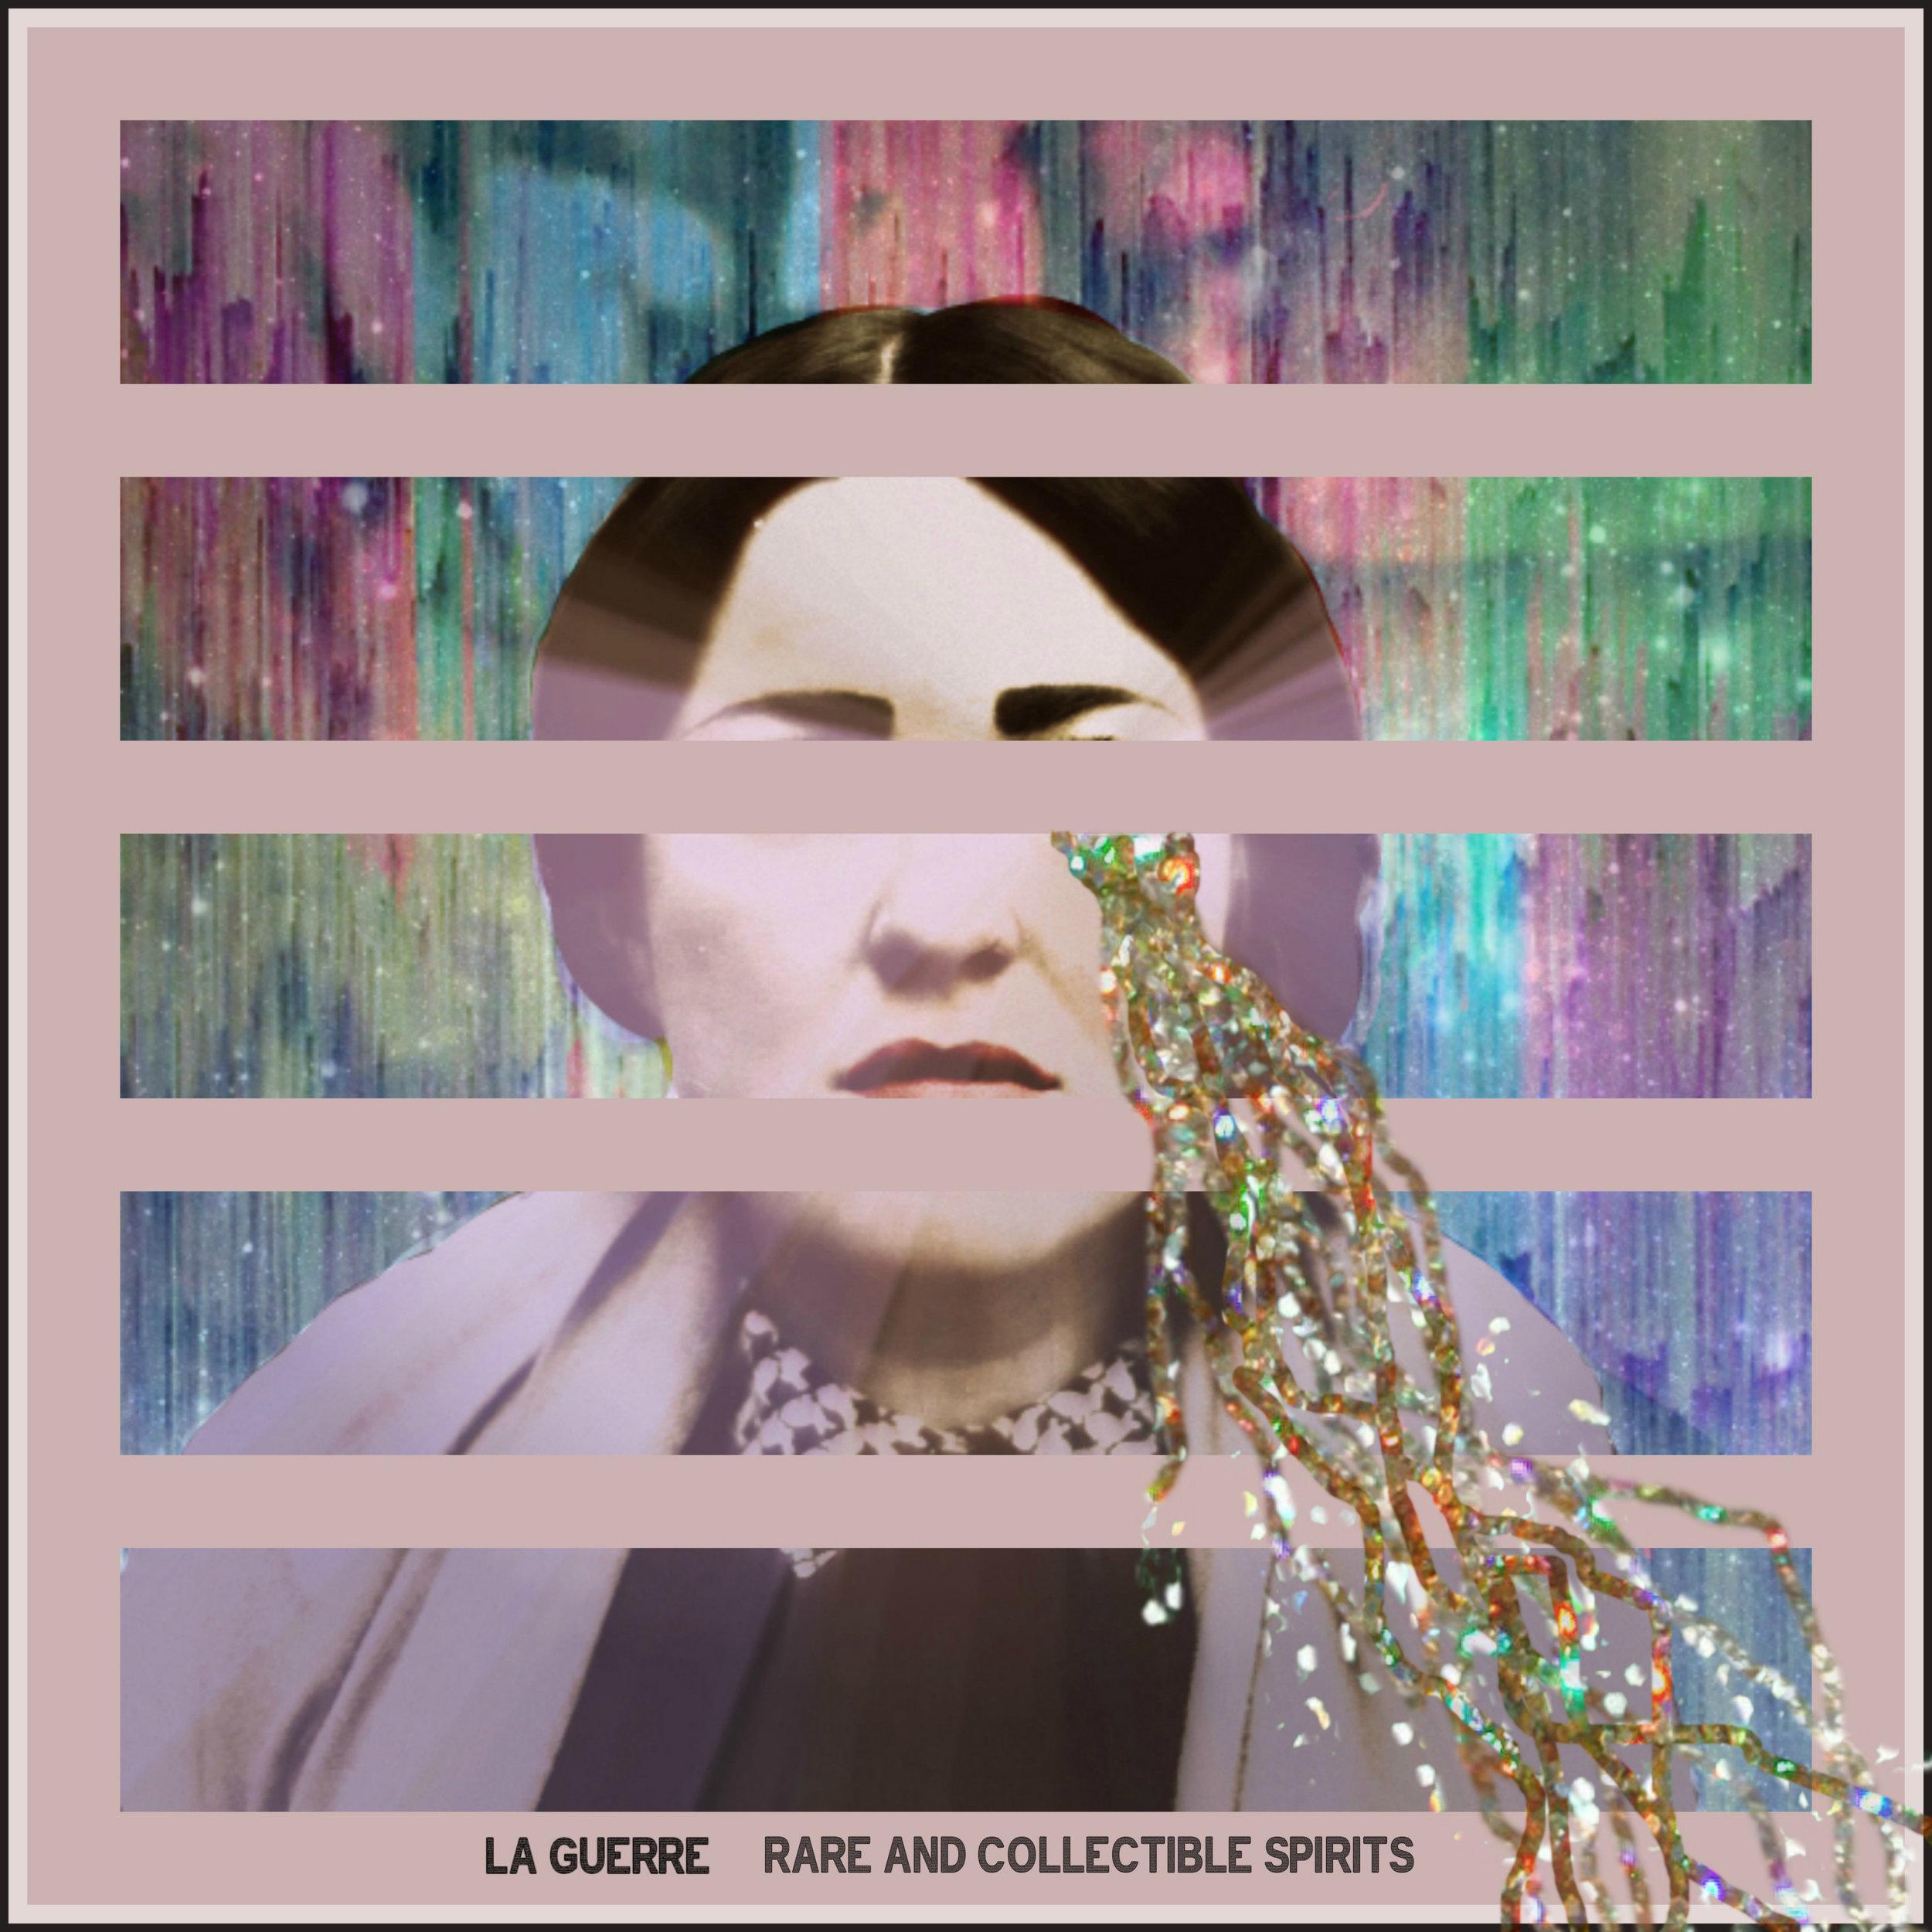 La Guerre - Rare and Collectible Spirits